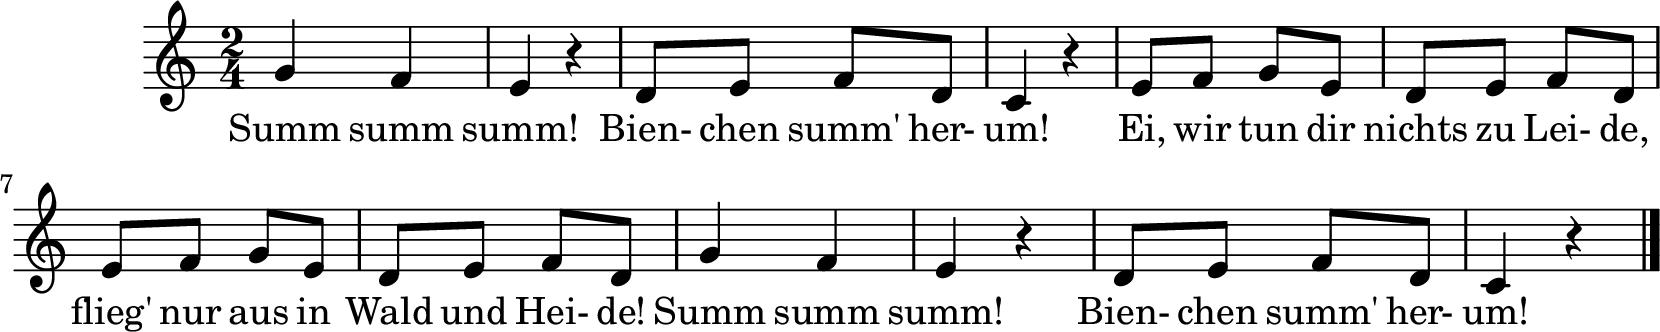 Notenblatt Music Sheet Summ, summ, summ (Bienchen summ herum)